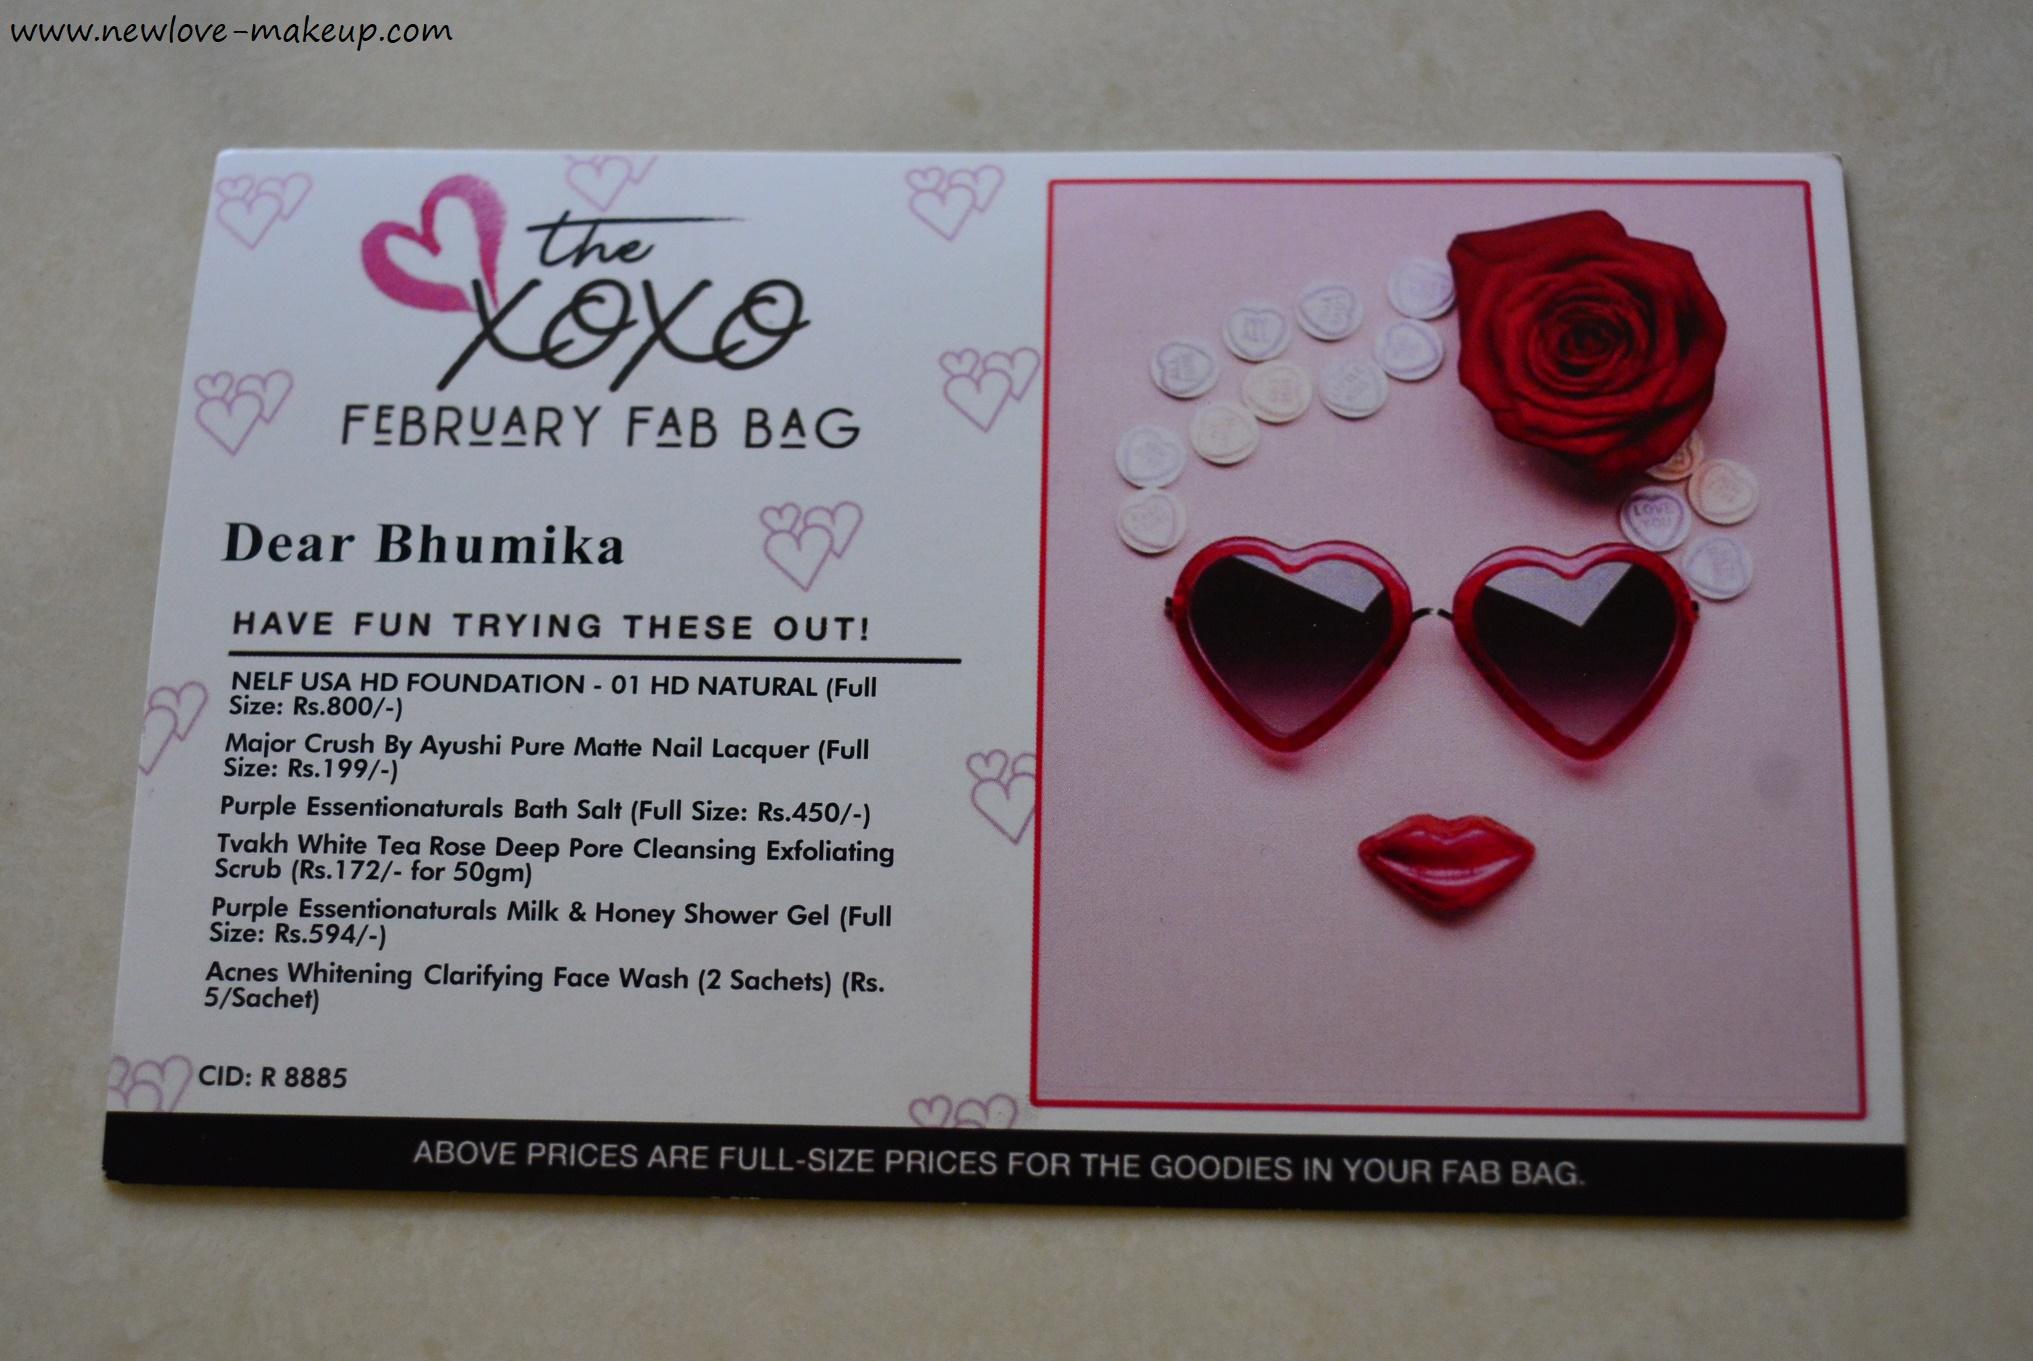 Feb 2018 Fab Bag Review & UnboxingFeb 2018 Fab Bag Review & Unboxing